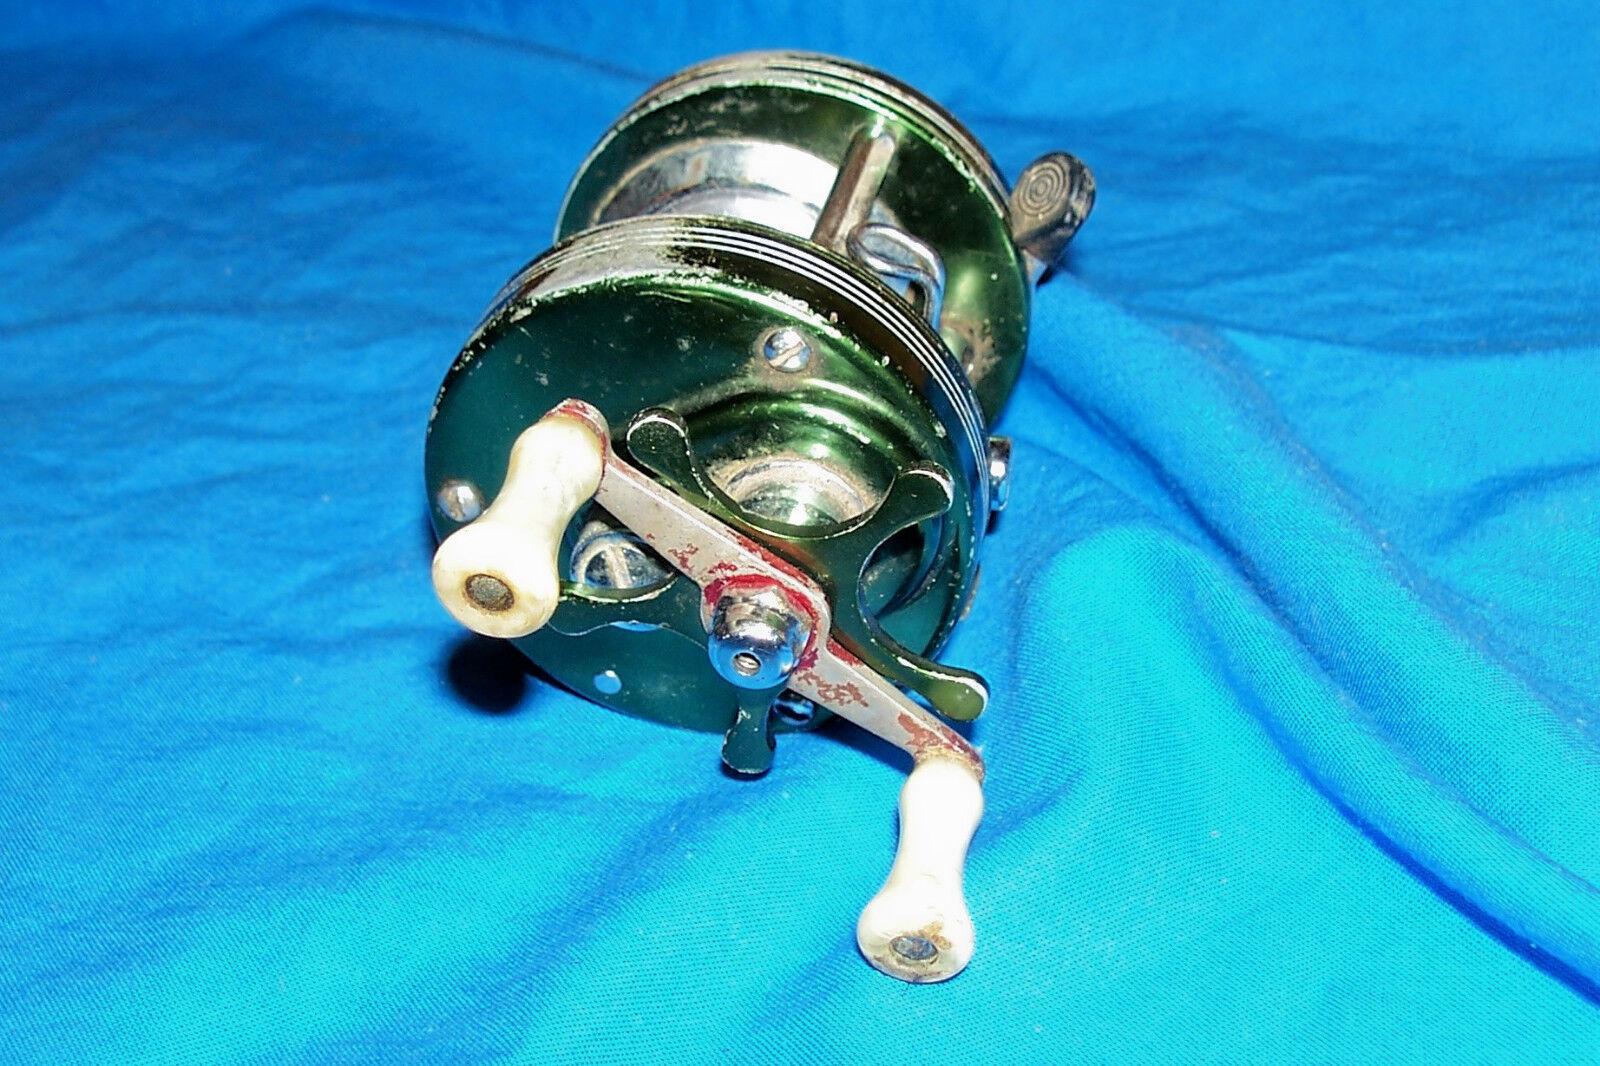 Vintage Heddon Mark IV 4 modello 3200 Bait Casting Fishing Reel Old Baitcasting